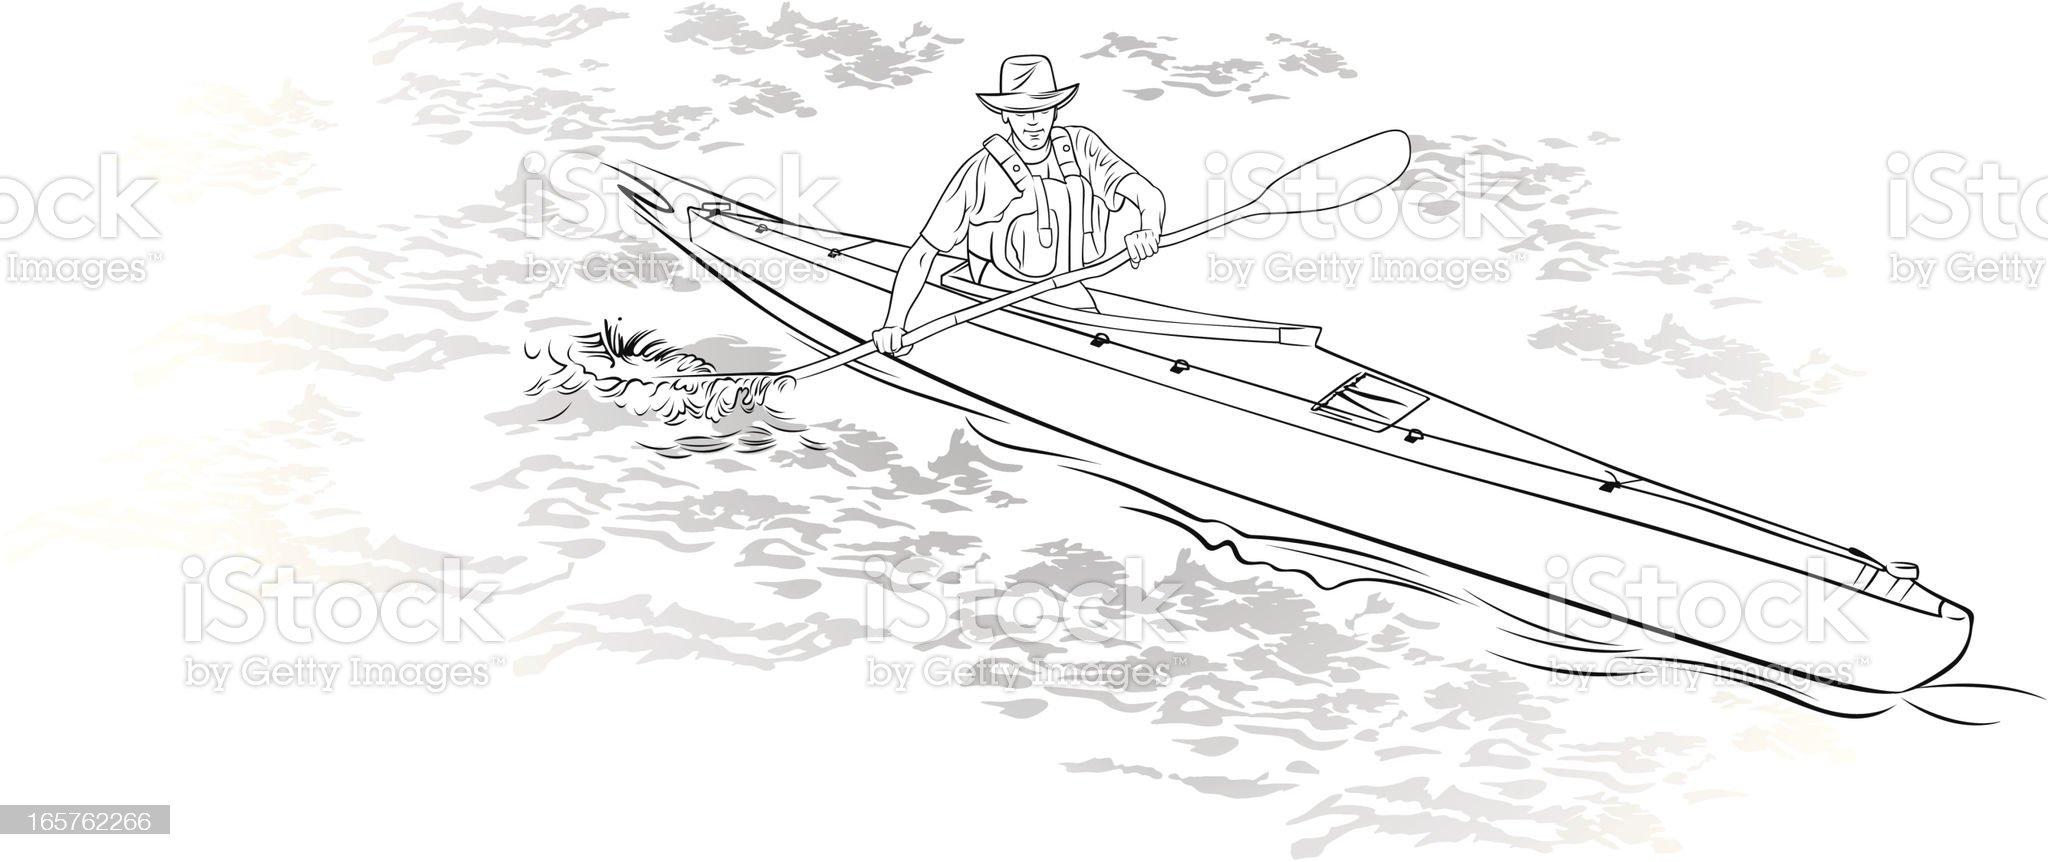 Single kayaker kayaking on open water royalty-free stock vector art